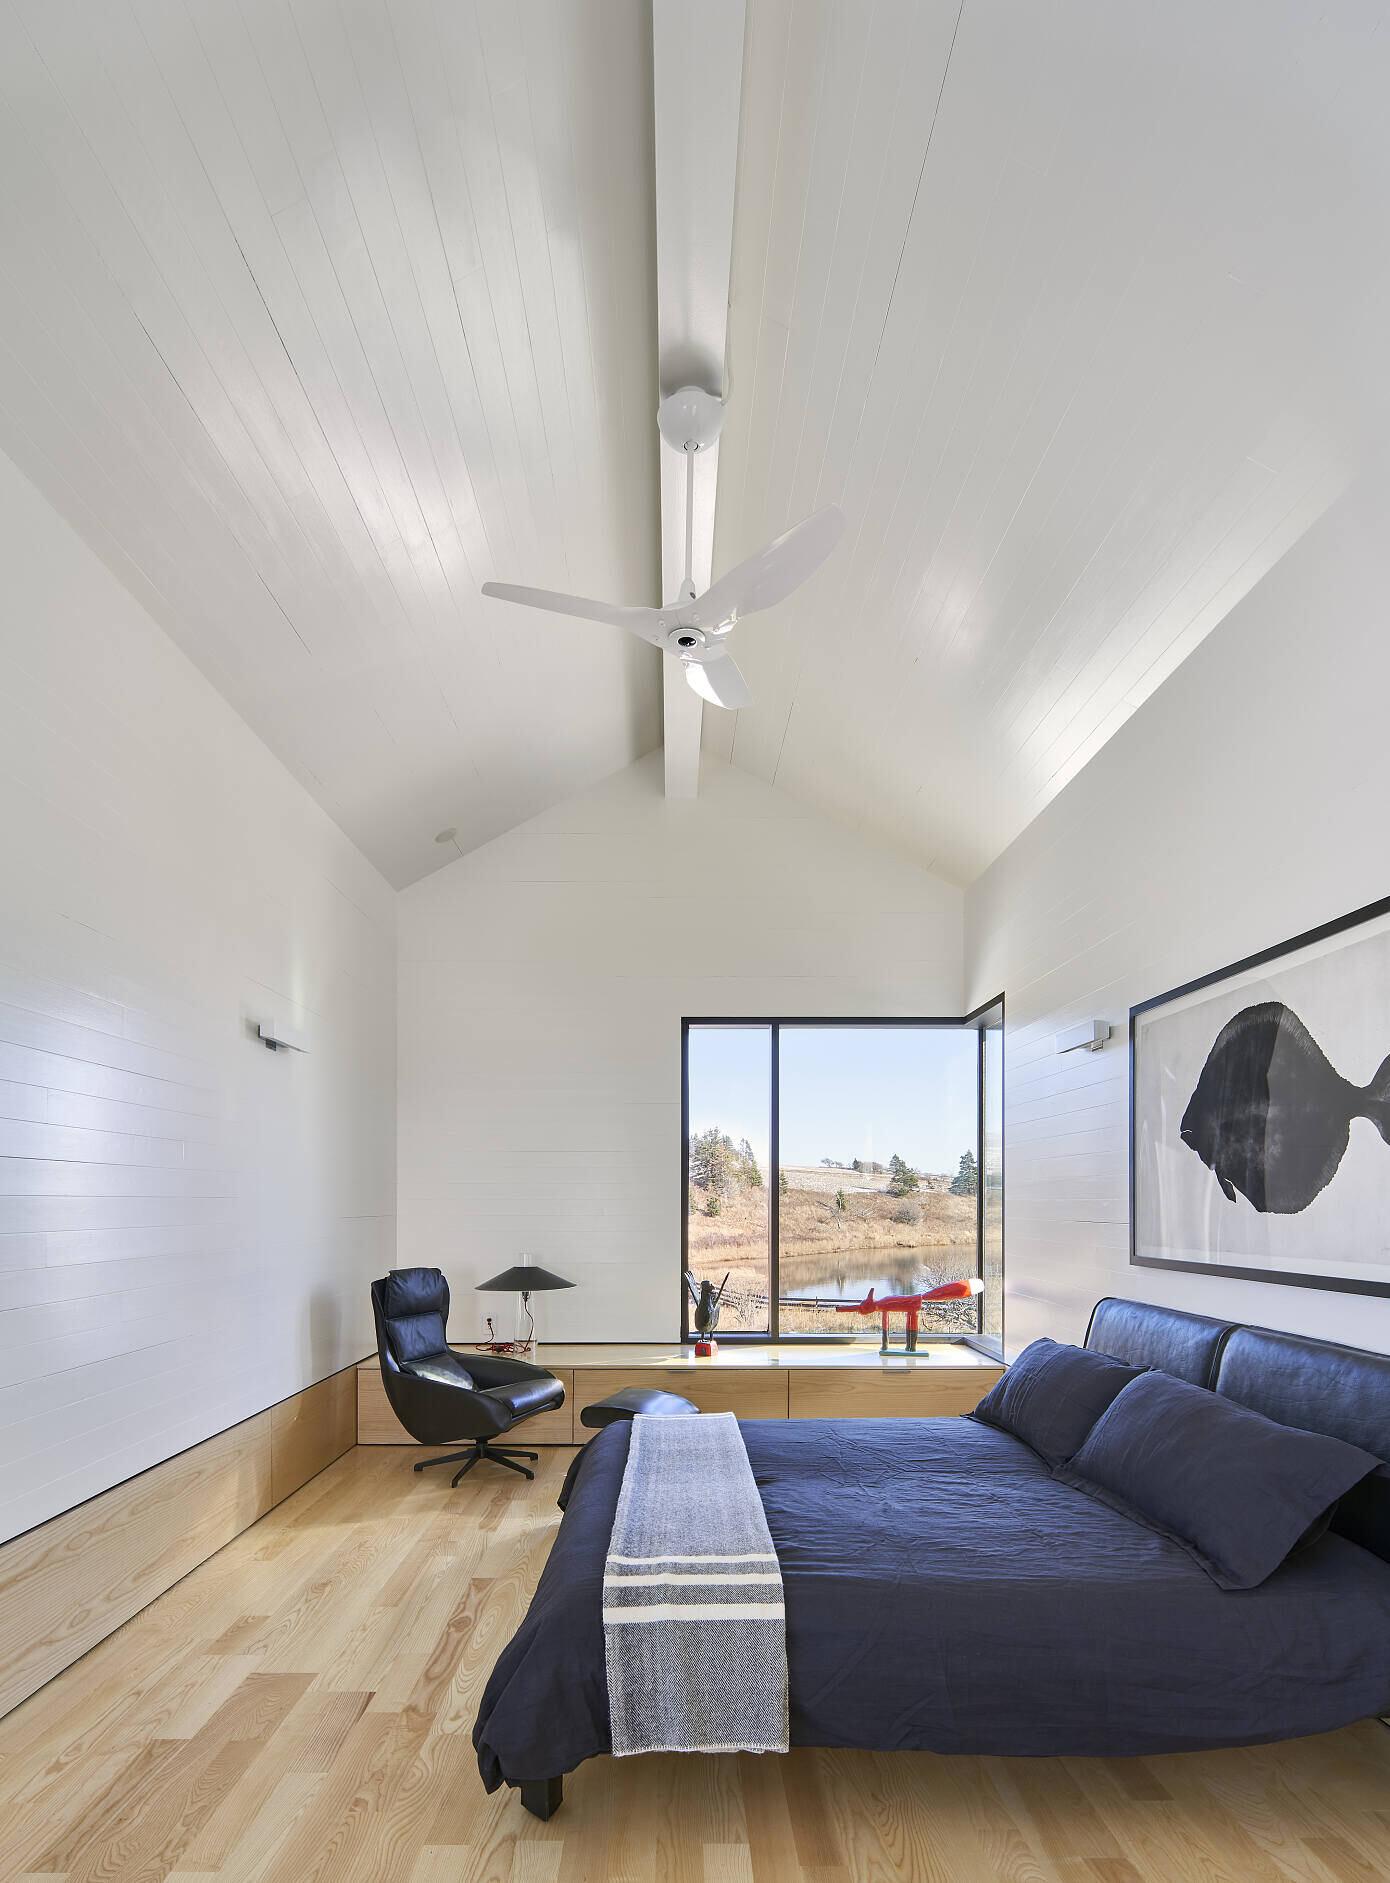 Smith Residence by Mackay-Lyons Sweetapple